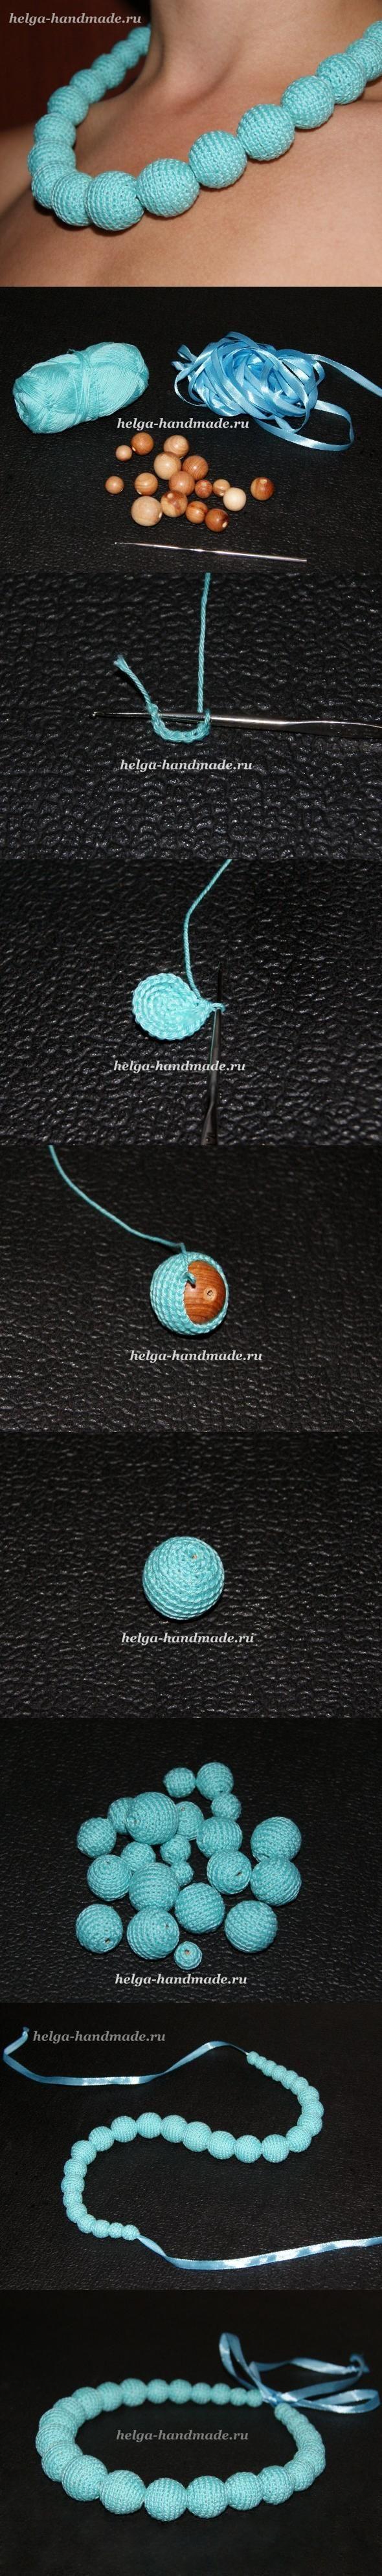 DIY Blue Knitting Beads Collar